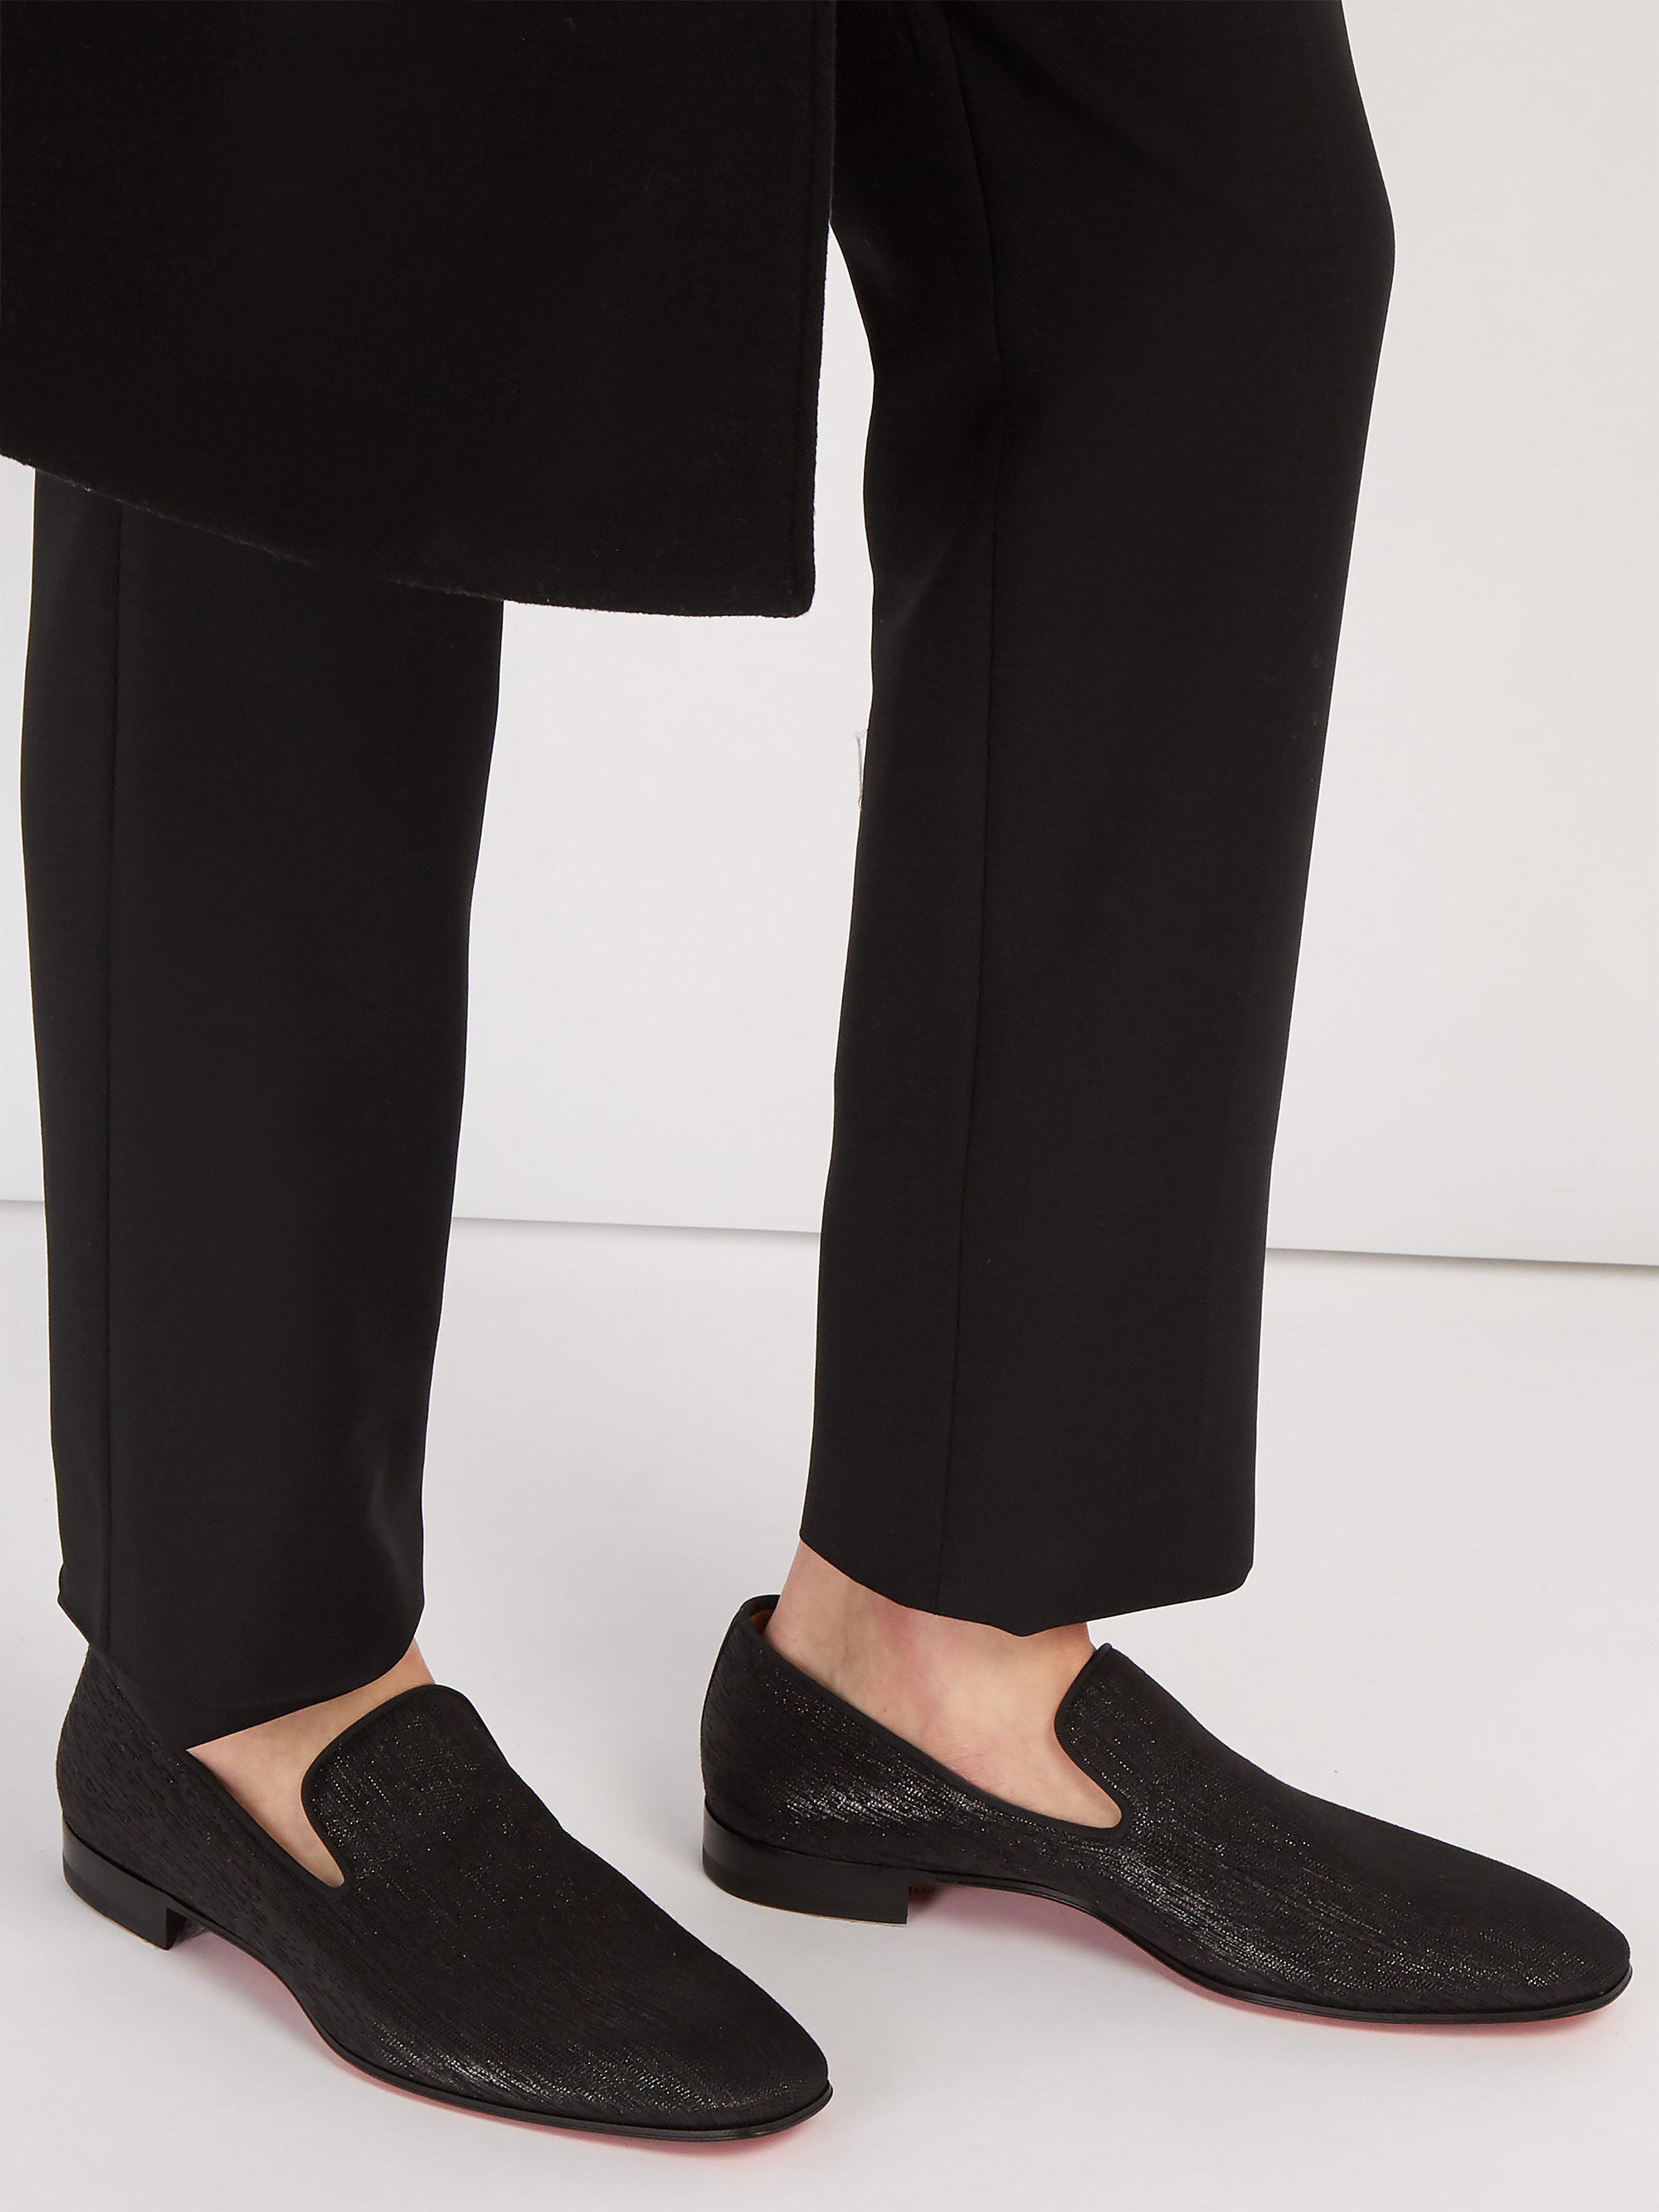 174394ee299 Christian Louboutin Dandelion Metallic Shantung Loafers in Black for Men -  Lyst